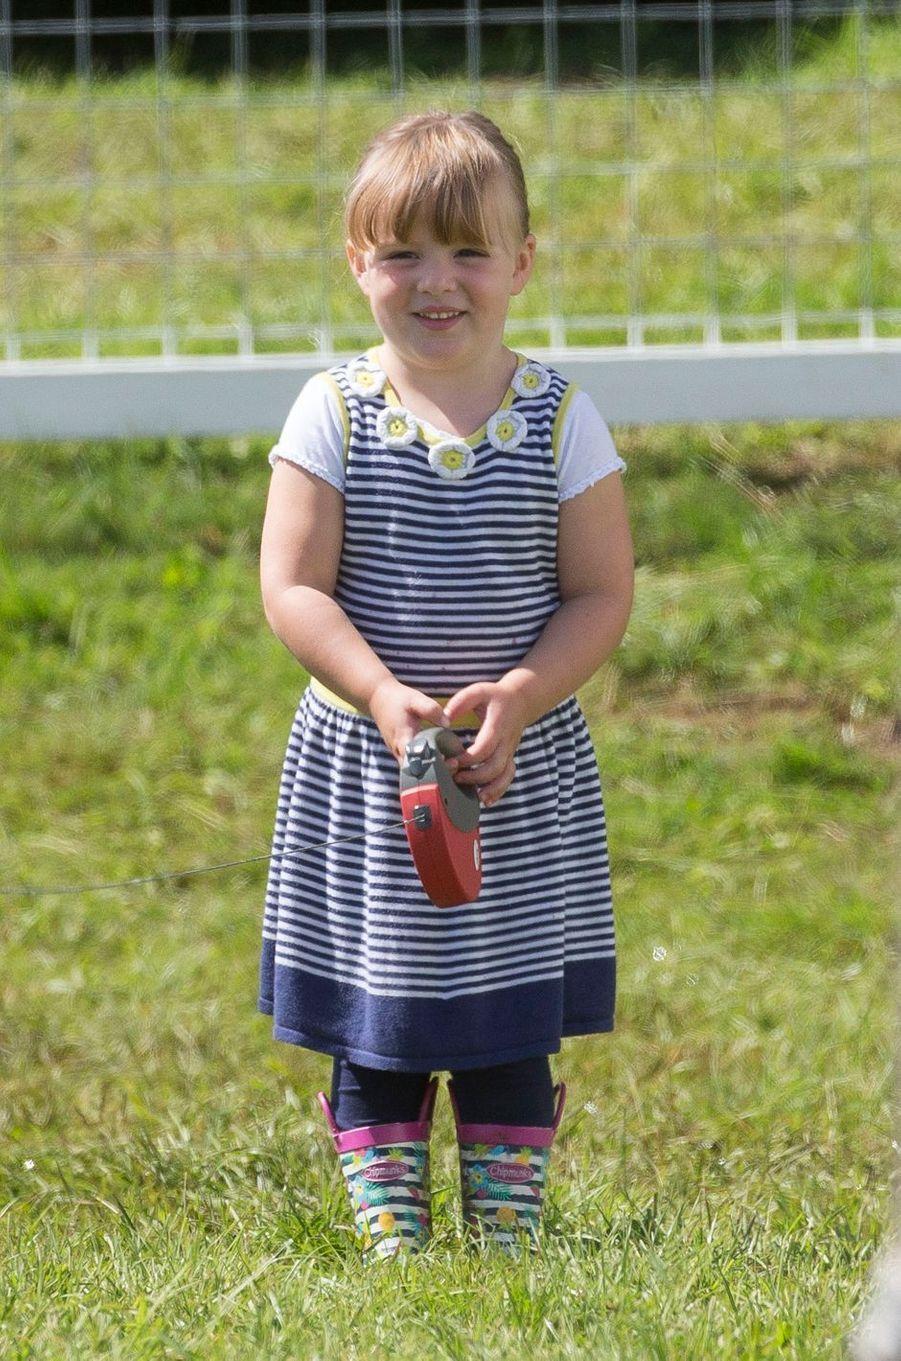 Mia Tindall, la fille de Zara Phillips, à Gatcombe Park le 5 août 2017